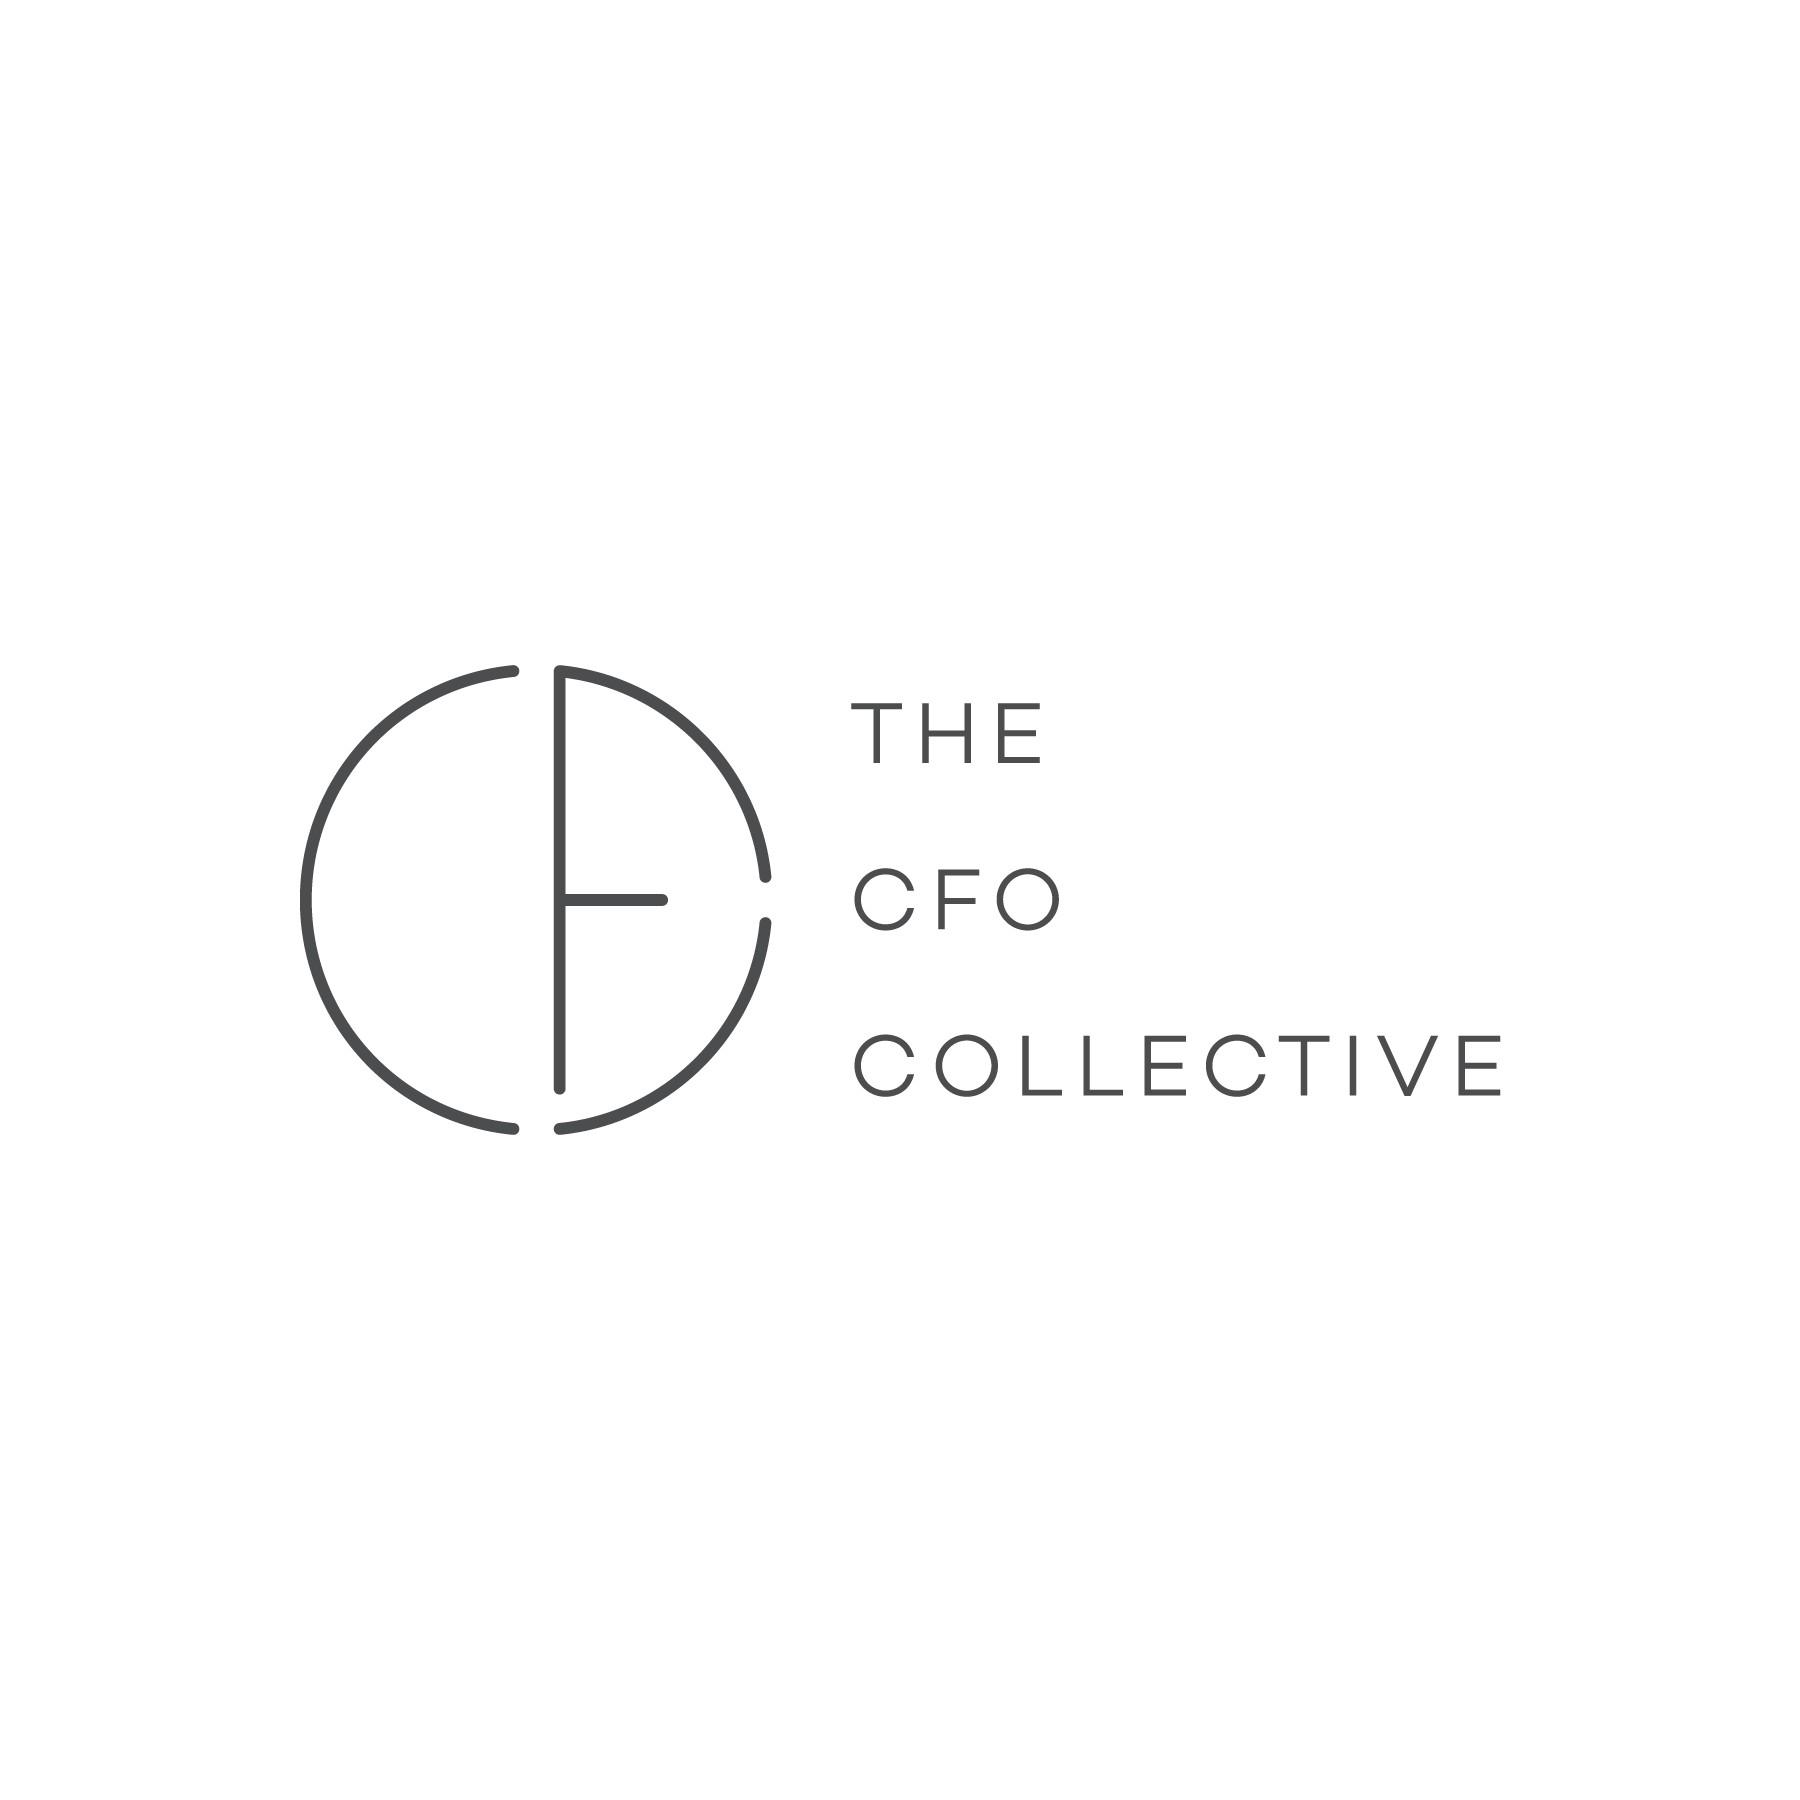 Create a minimalistic logo for a virtual CFO start up